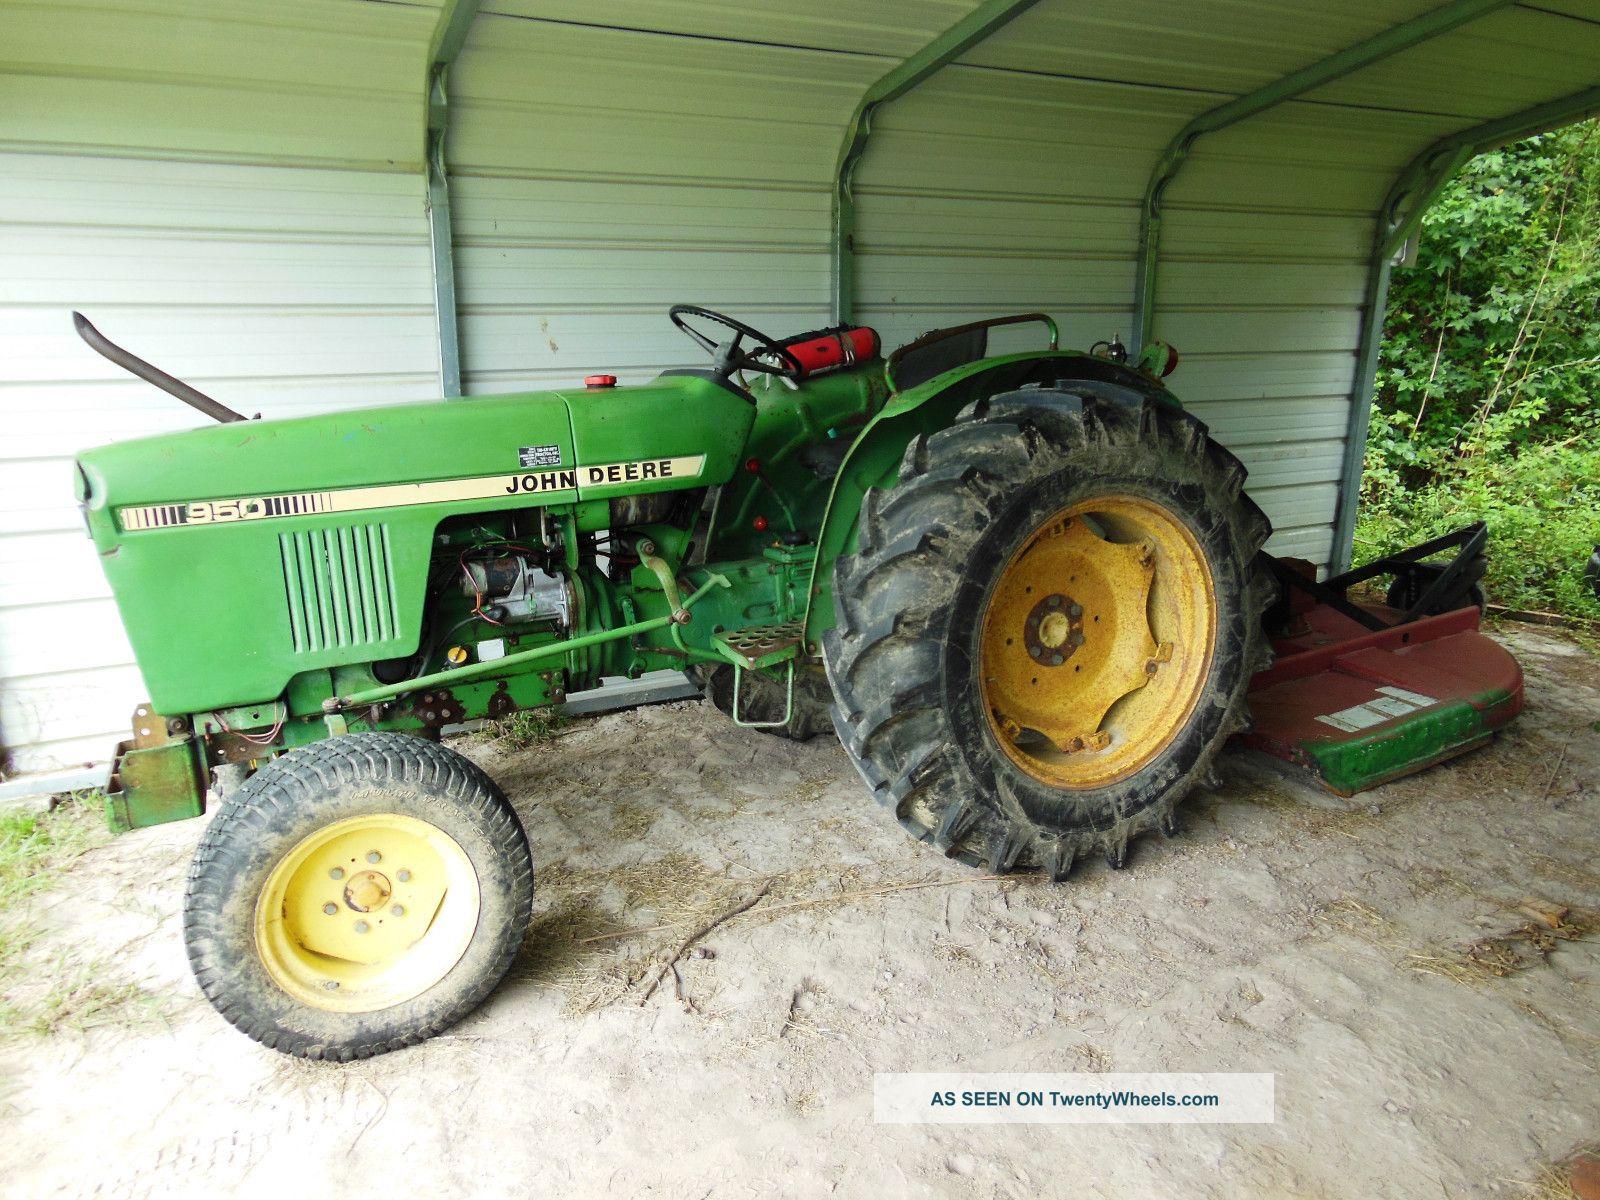 John Deere Bush Hog : John deere tractor with bush hog mower cutter